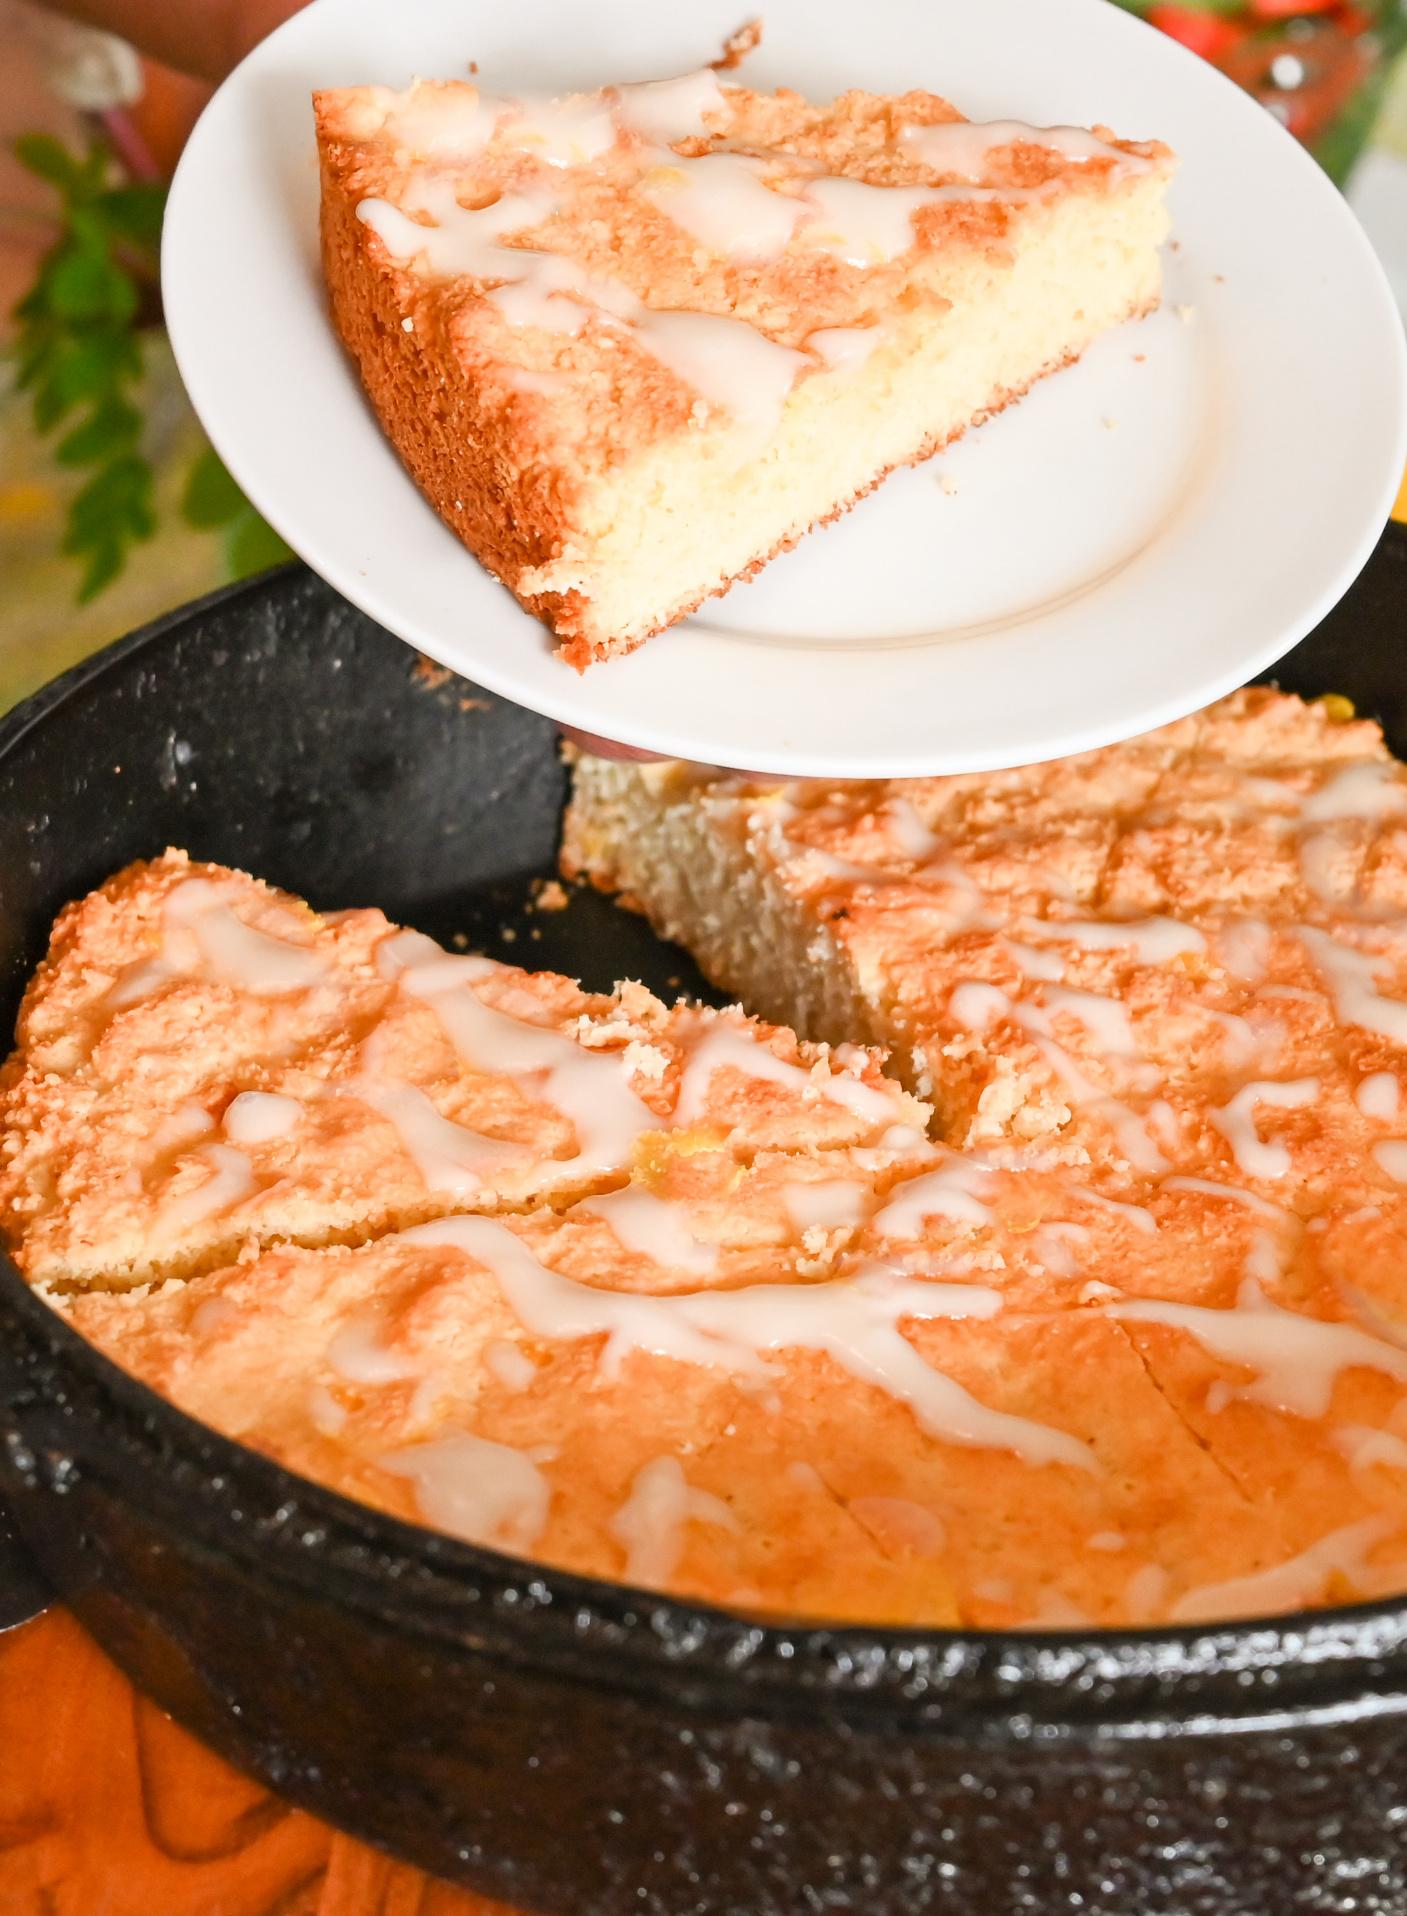 keto vanilla scones sliced and ready to serve